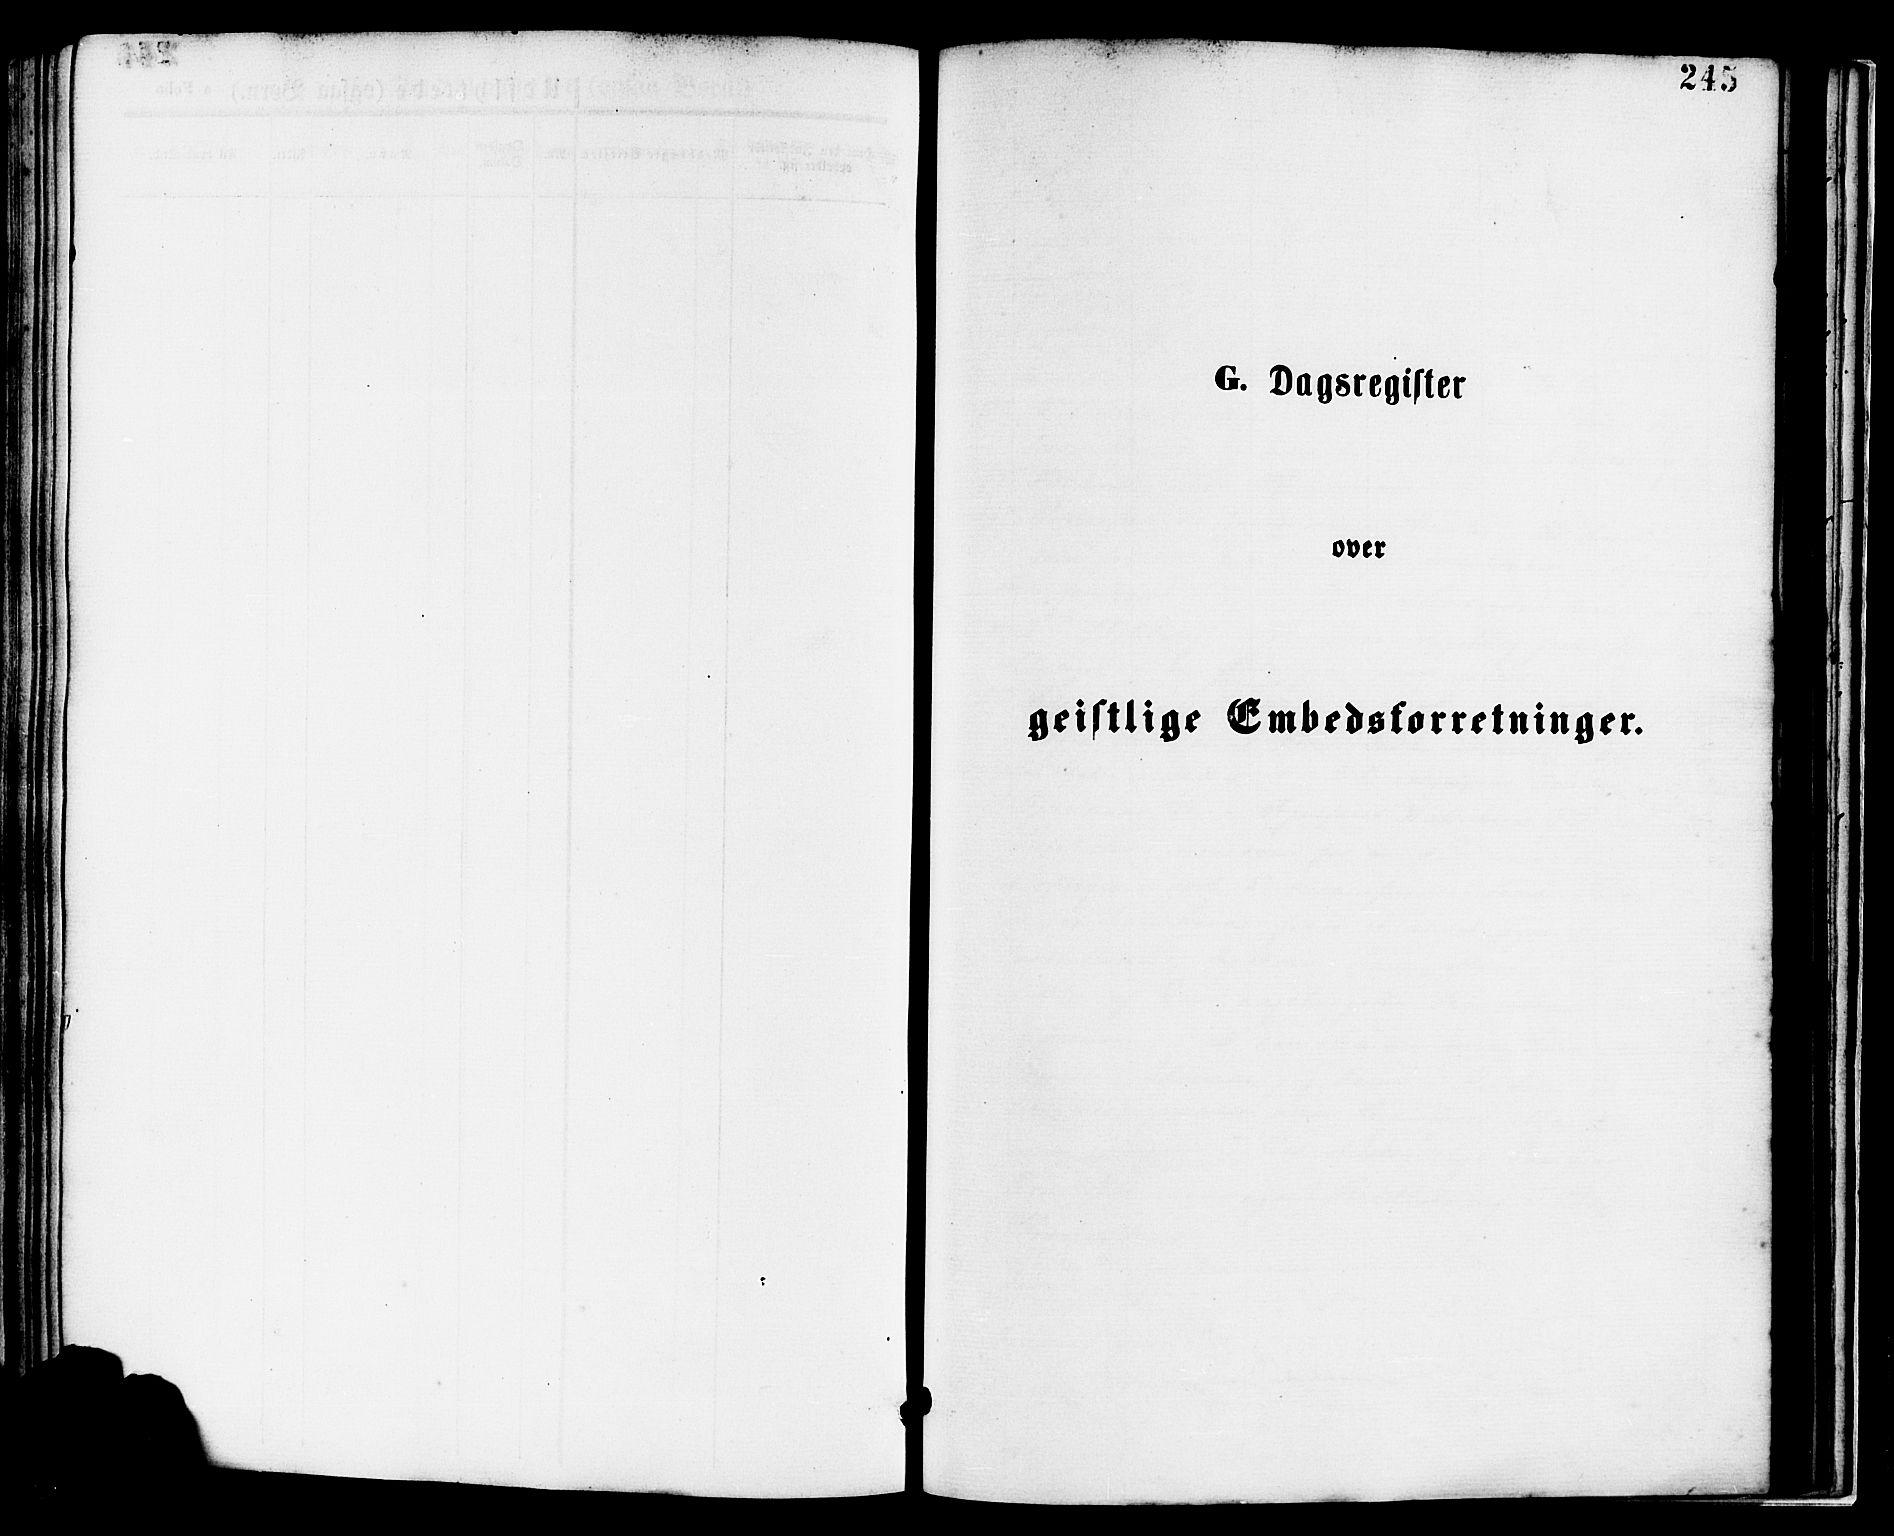 SAST, Nedstrand sokneprestkontor, IV: Ministerialbok nr. A 11, 1877-1887, s. 245